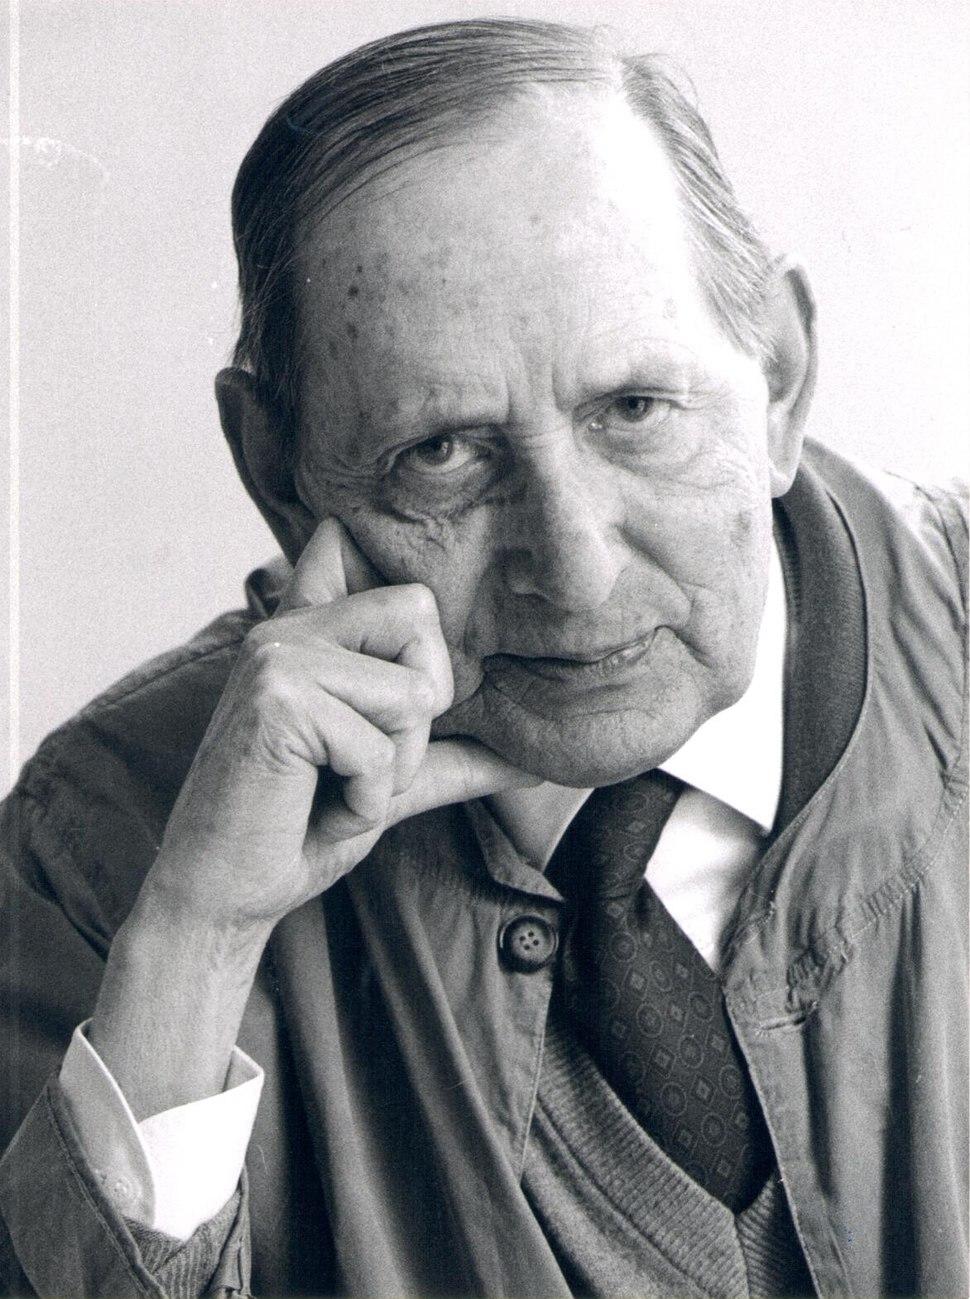 Miguel Delibes (1998) - 1